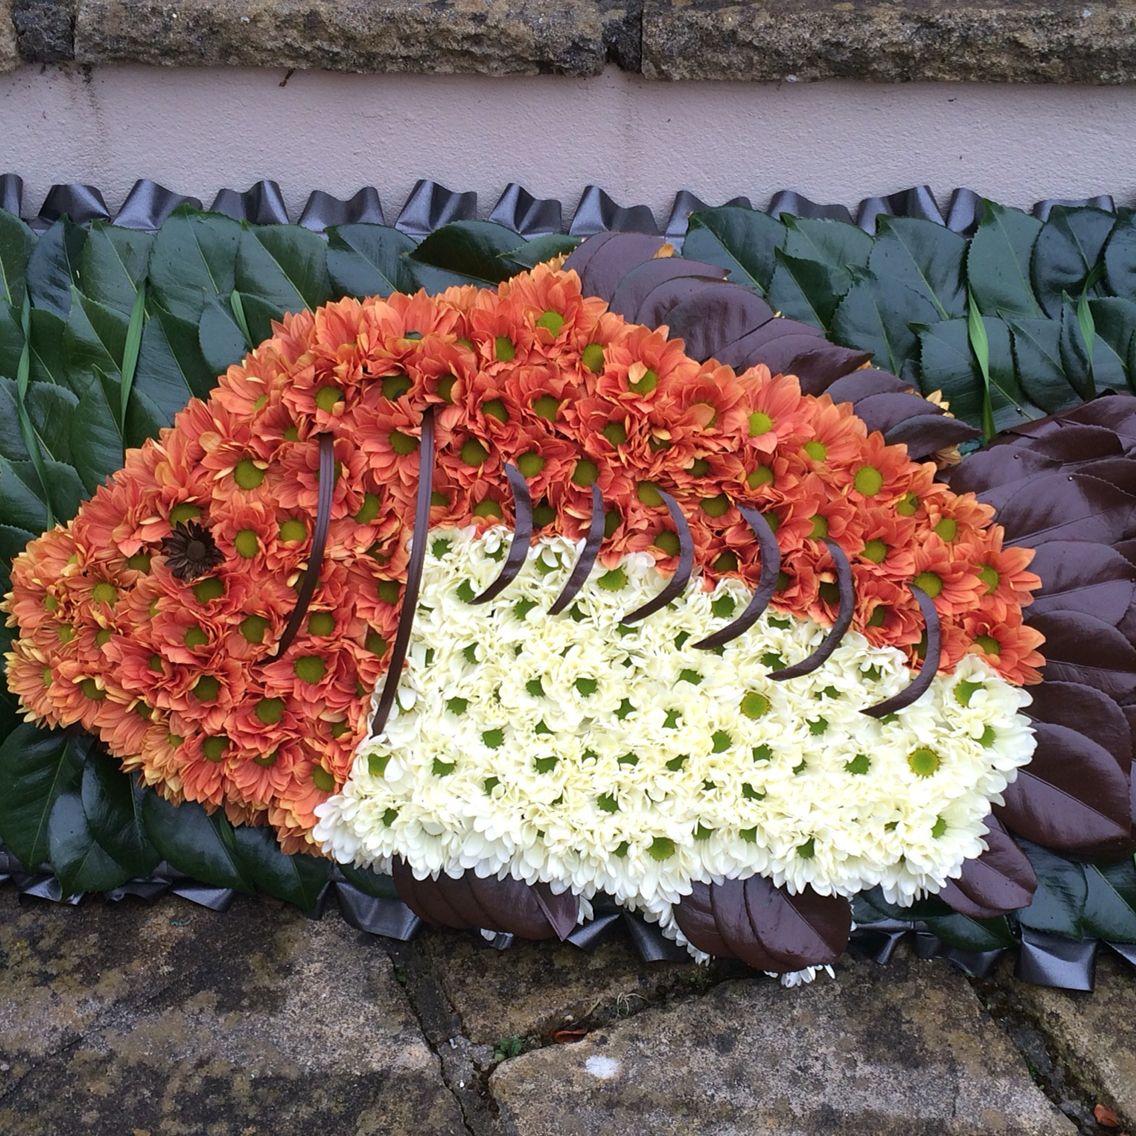 Funeral carp fish funeral pinterest funeral and funeral flowers funeral carp fish carp fishingfuneral flowers izmirmasajfo